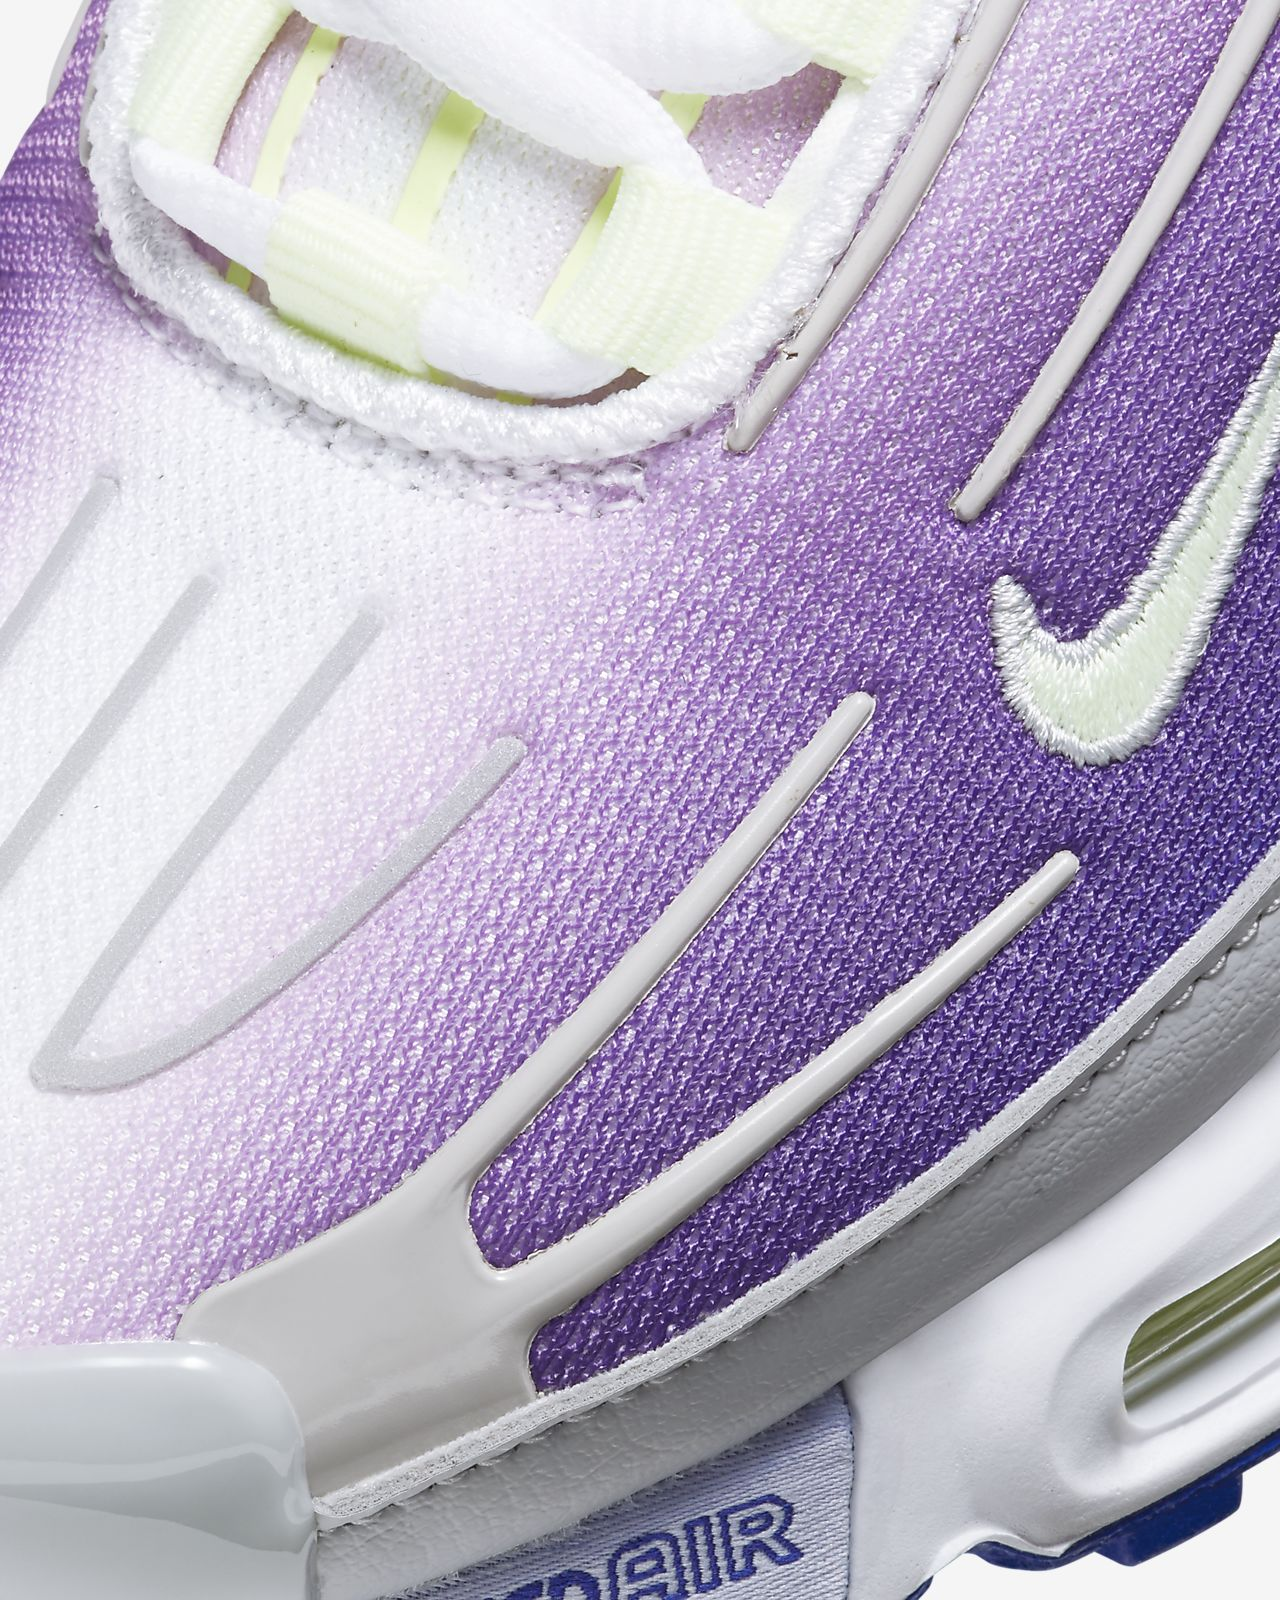 Sko Nike Air Max Plus 3 för ungdom